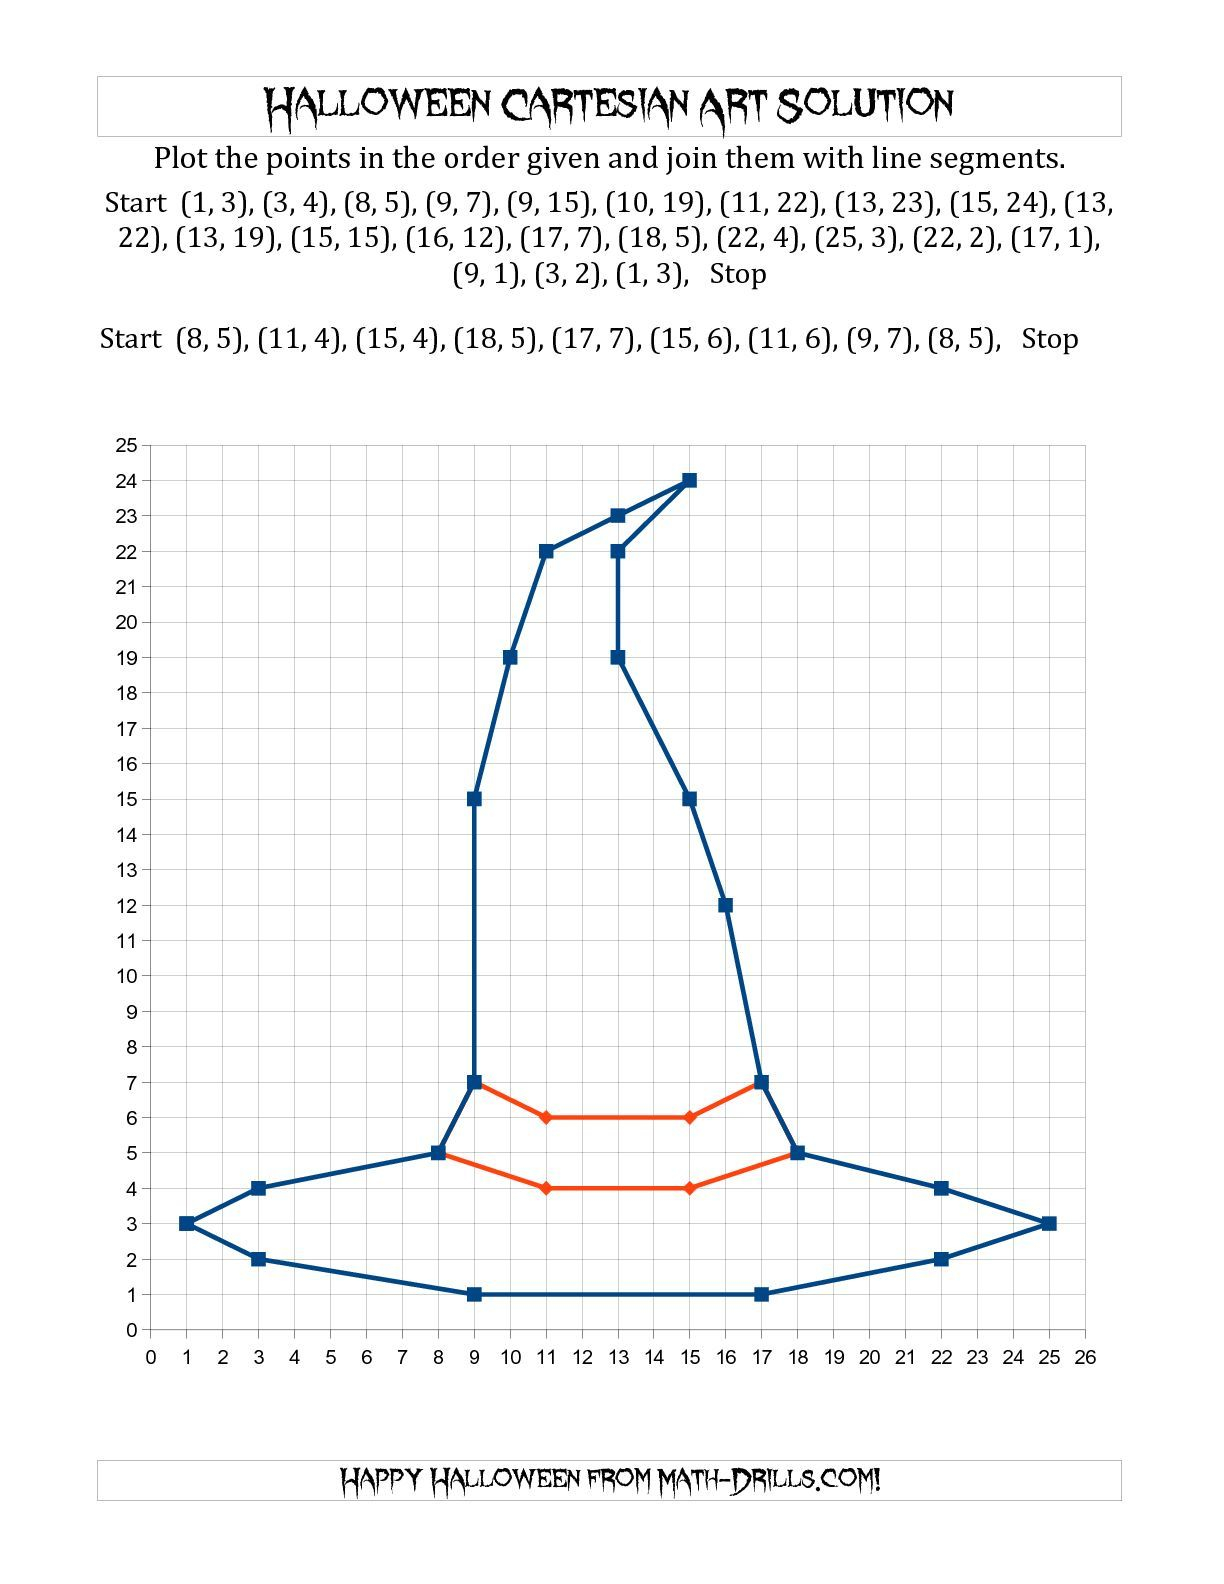 The Cartesian Art Halloween Witch Hat Math Worksheet From